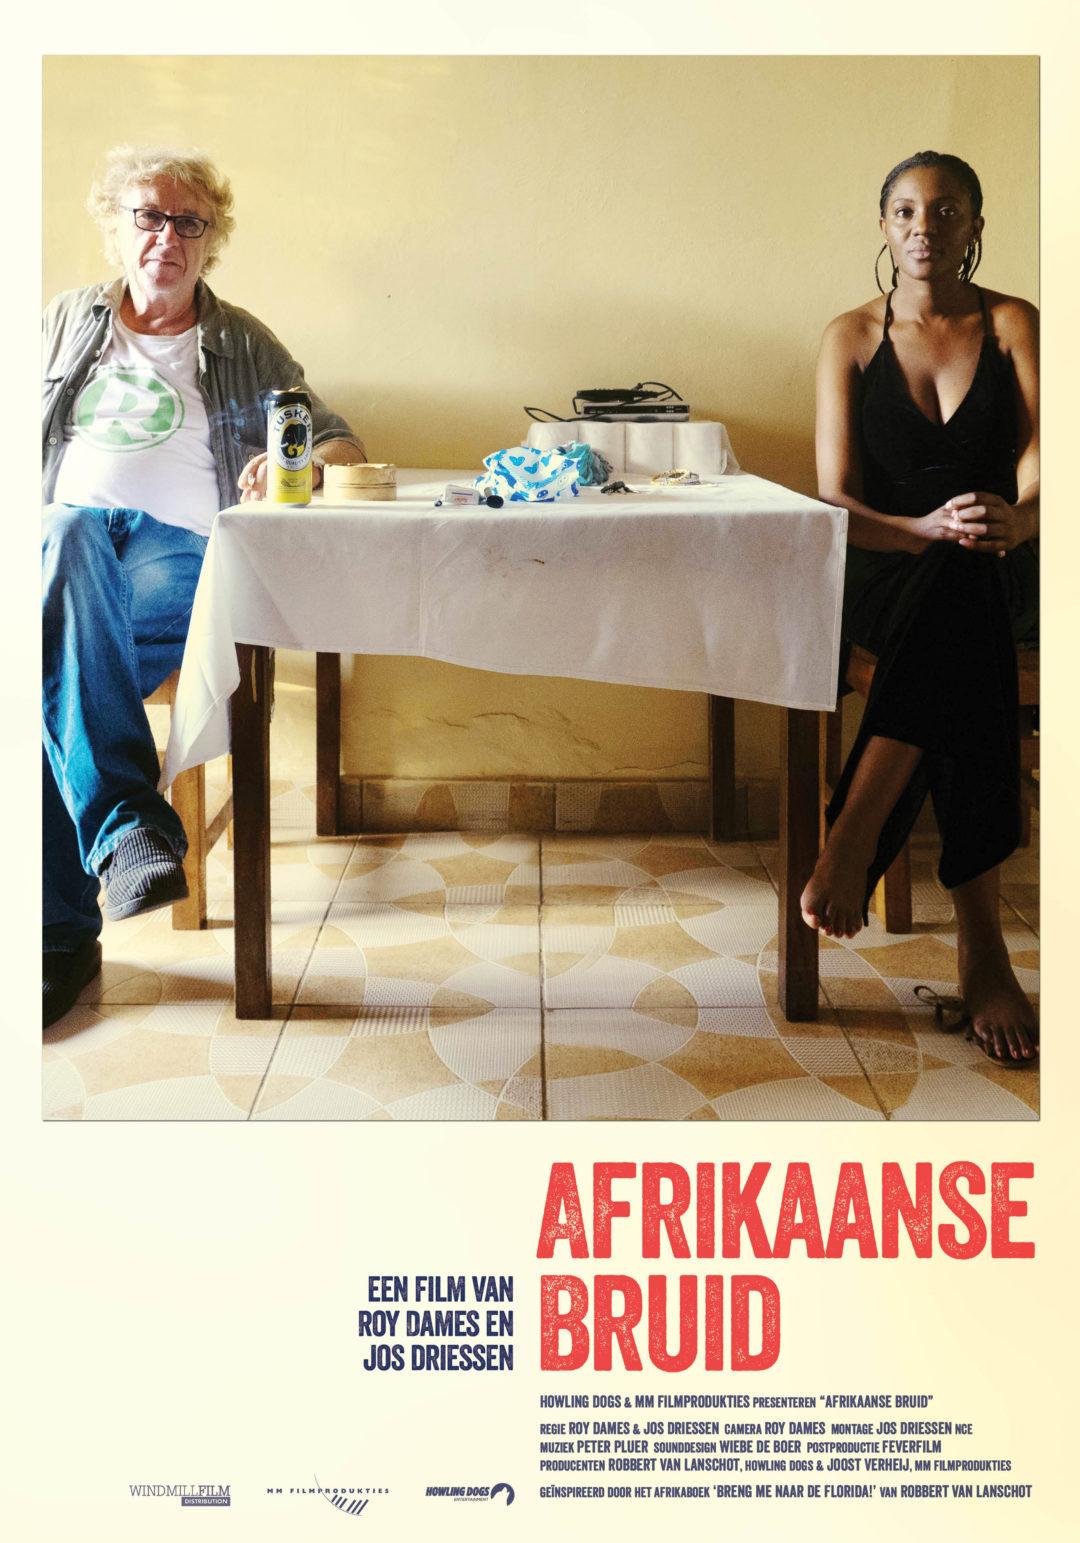 Afrikaanse-Bruid_ps_1_jpg_sd-high.jpg